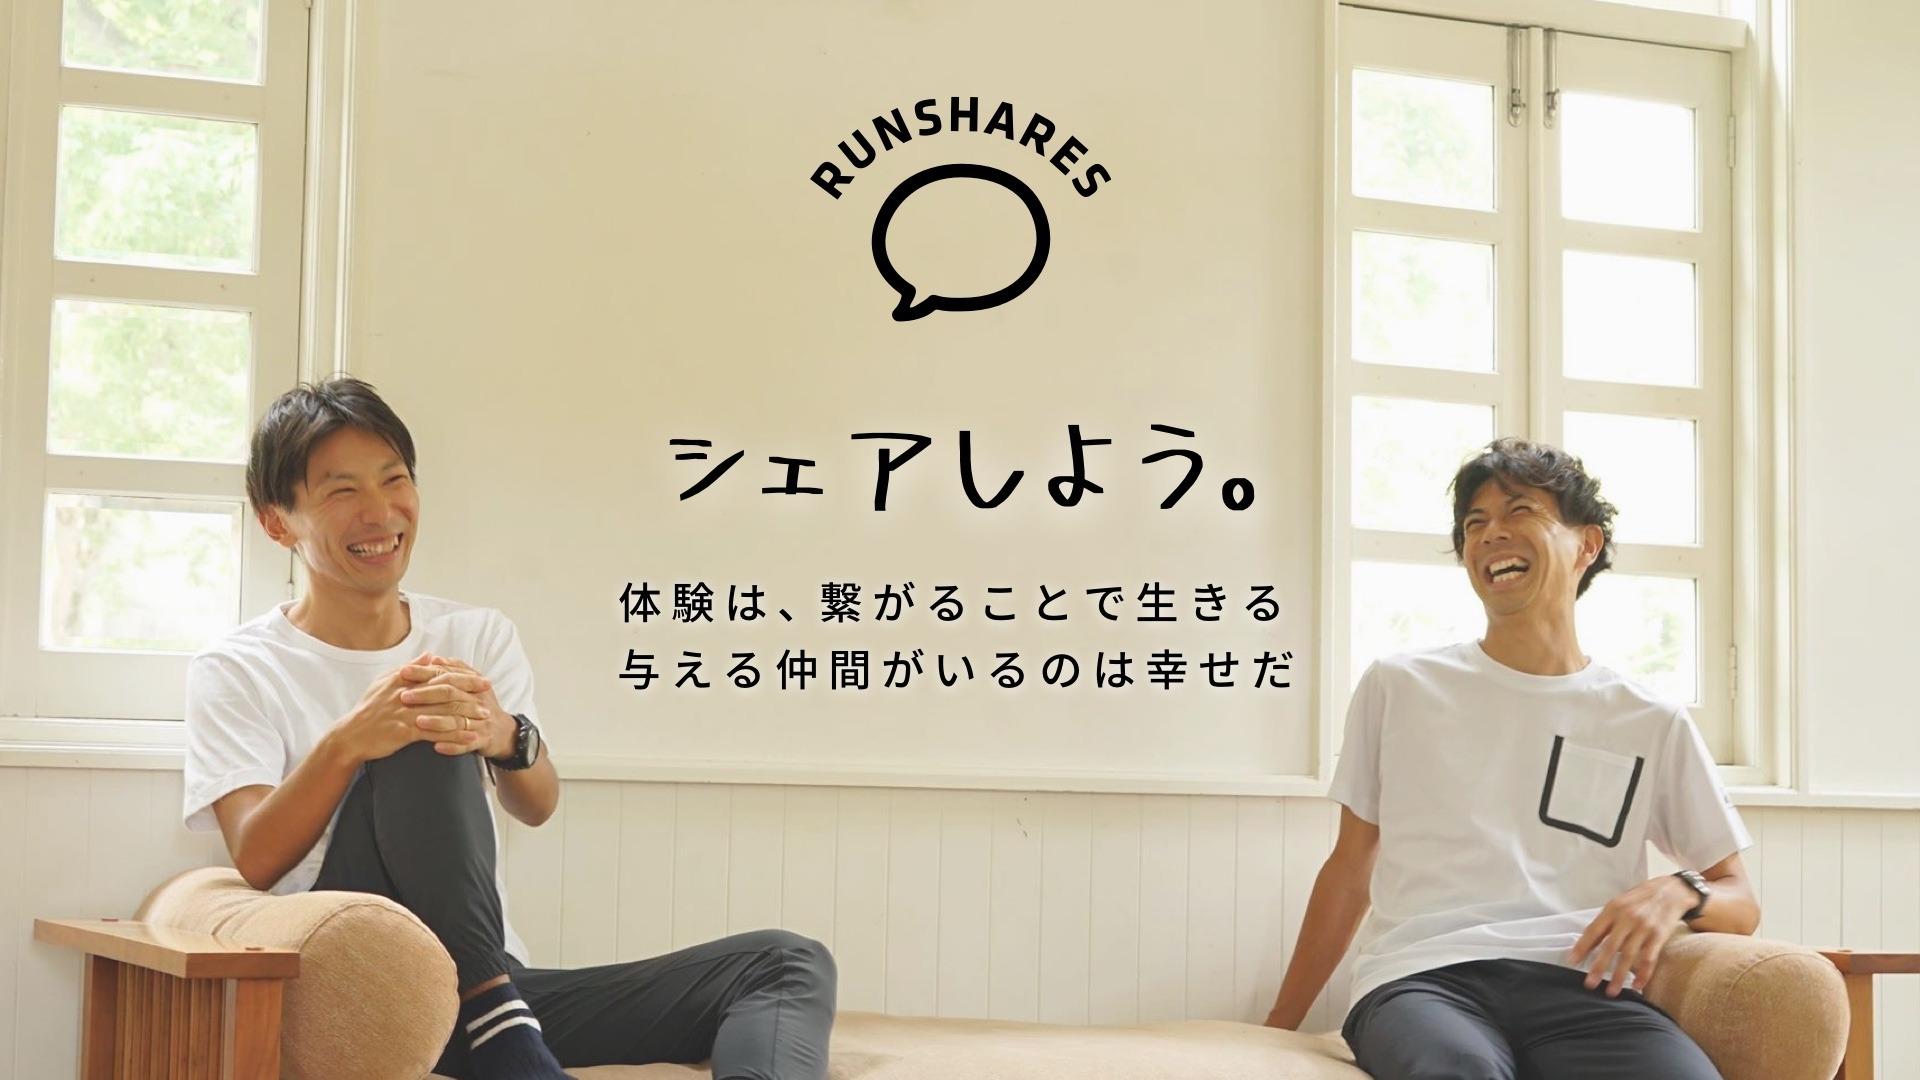 RUNSHARES / ランシェアーズ